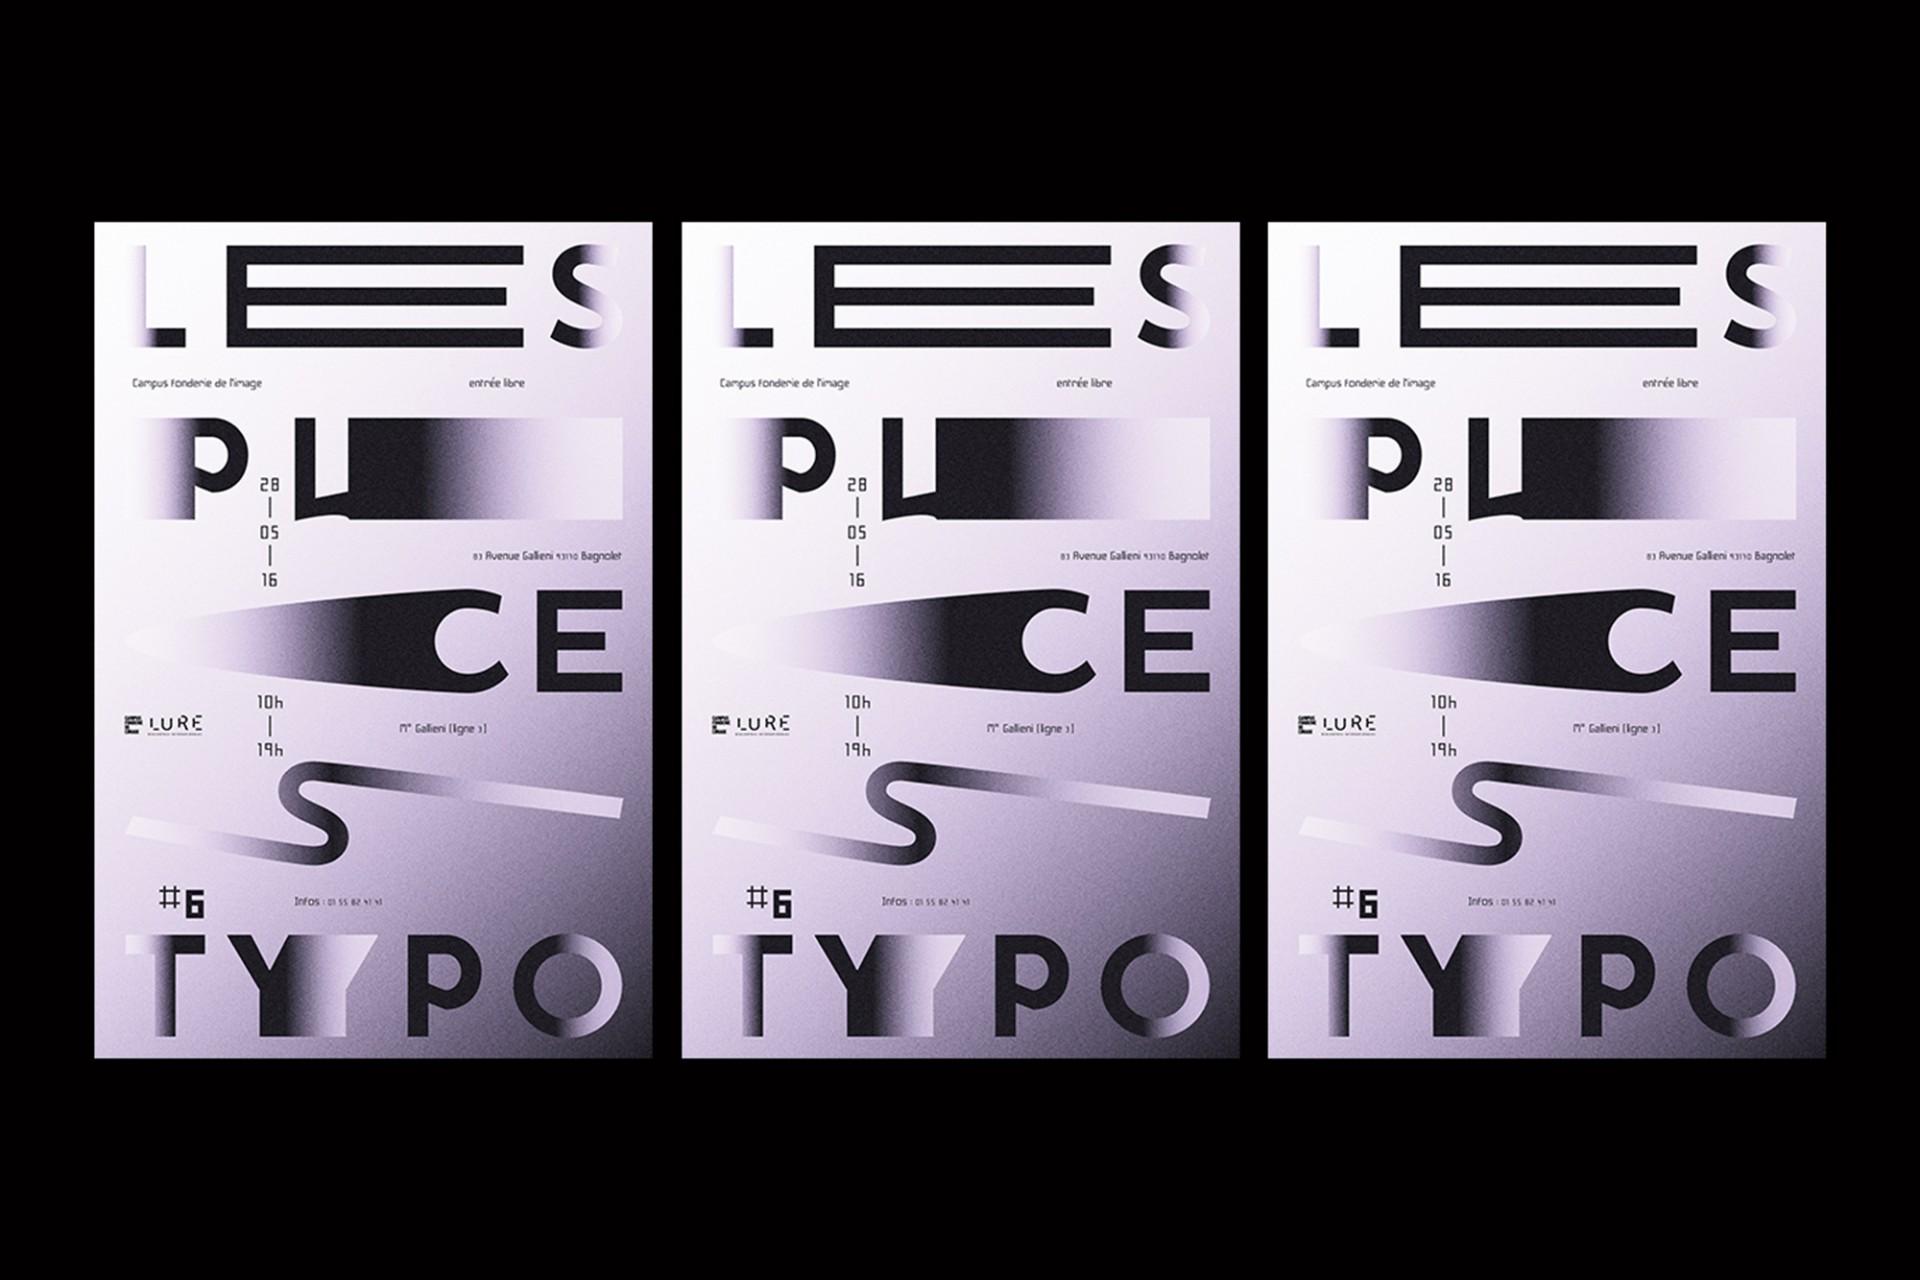 LES PUCES TYPO | BRANDING